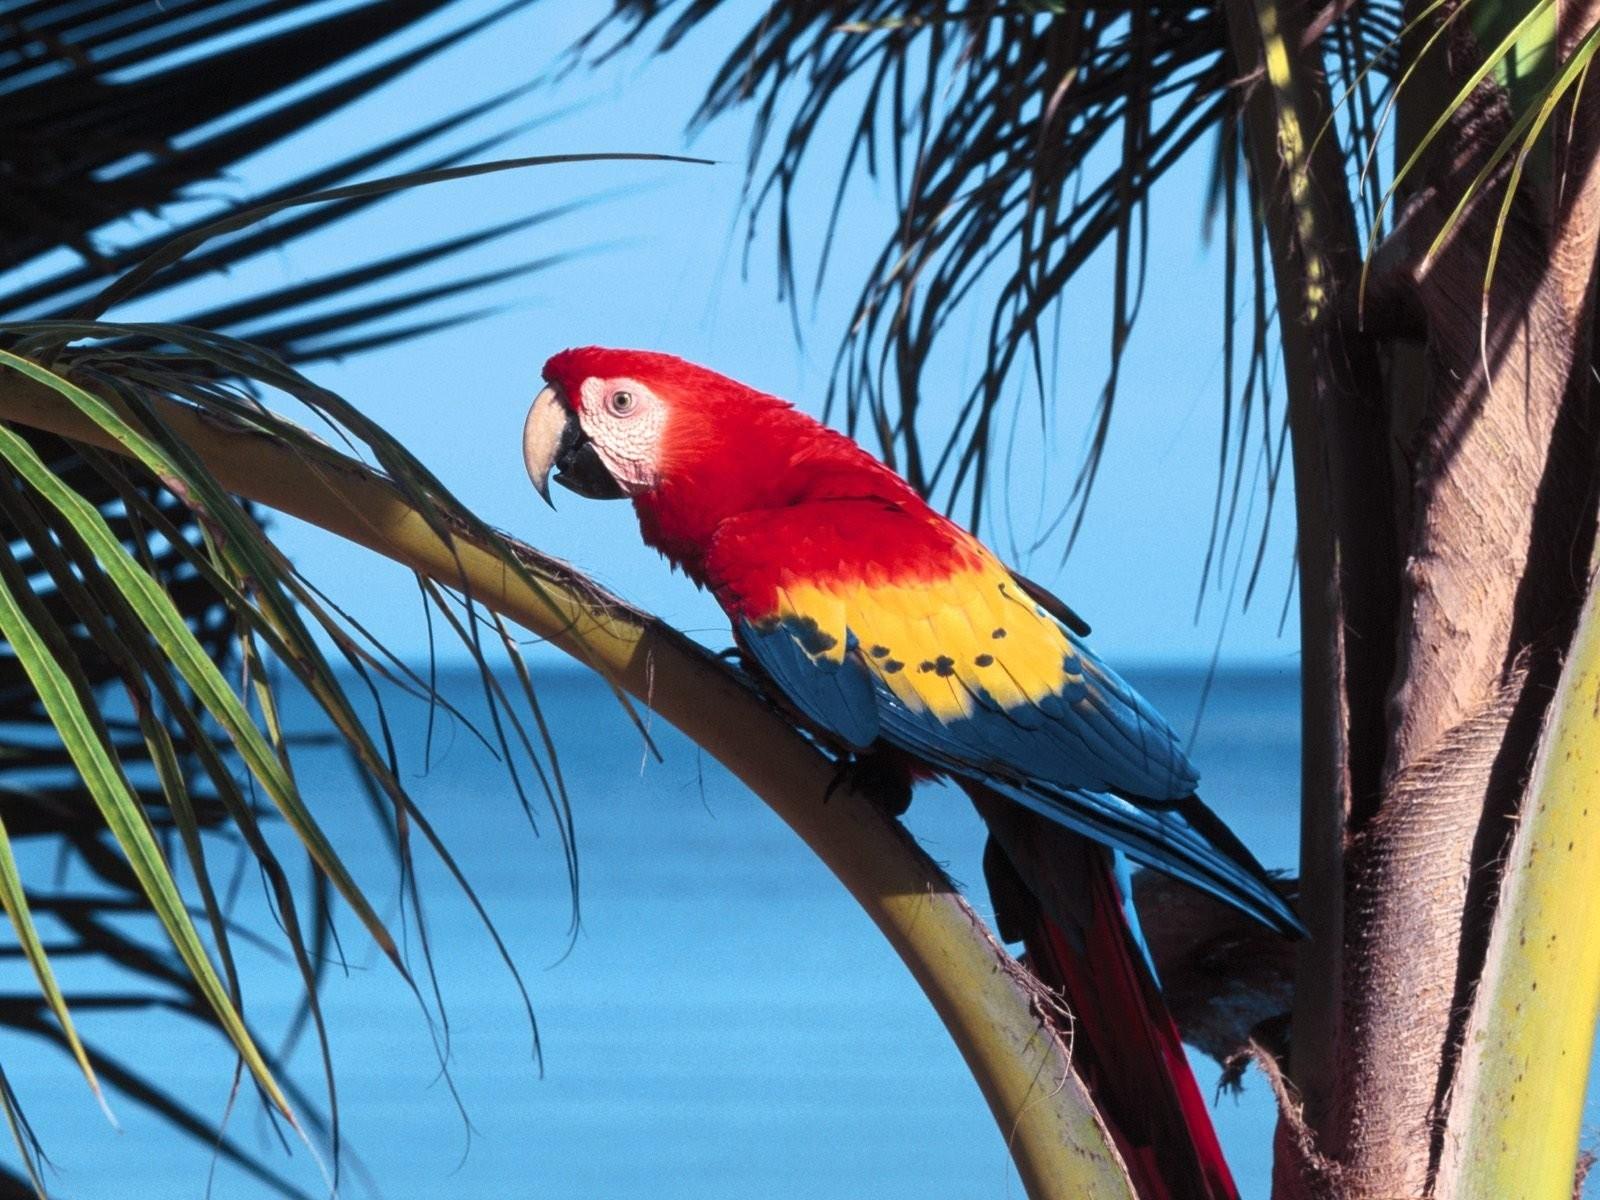 Tropical Birds On The Beach - HD Wallpaper